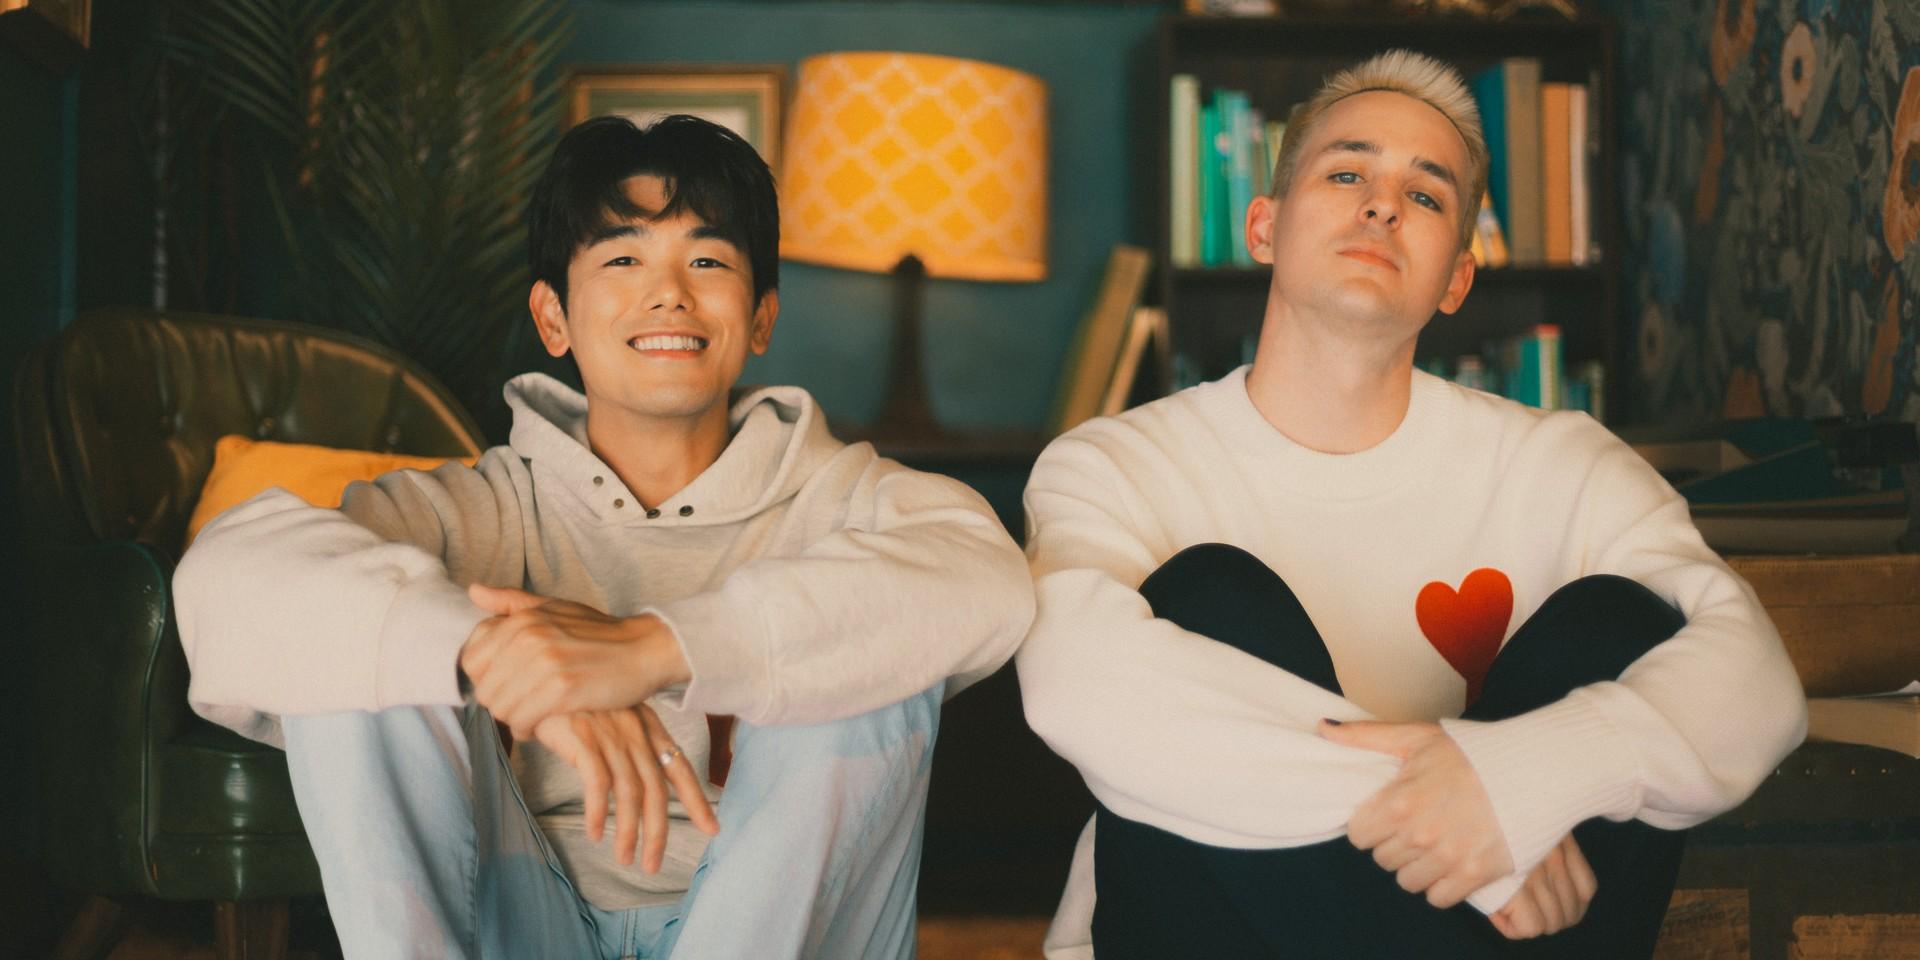 vaultboy enlists Eric Nam for 'everything sucks' remix – listen